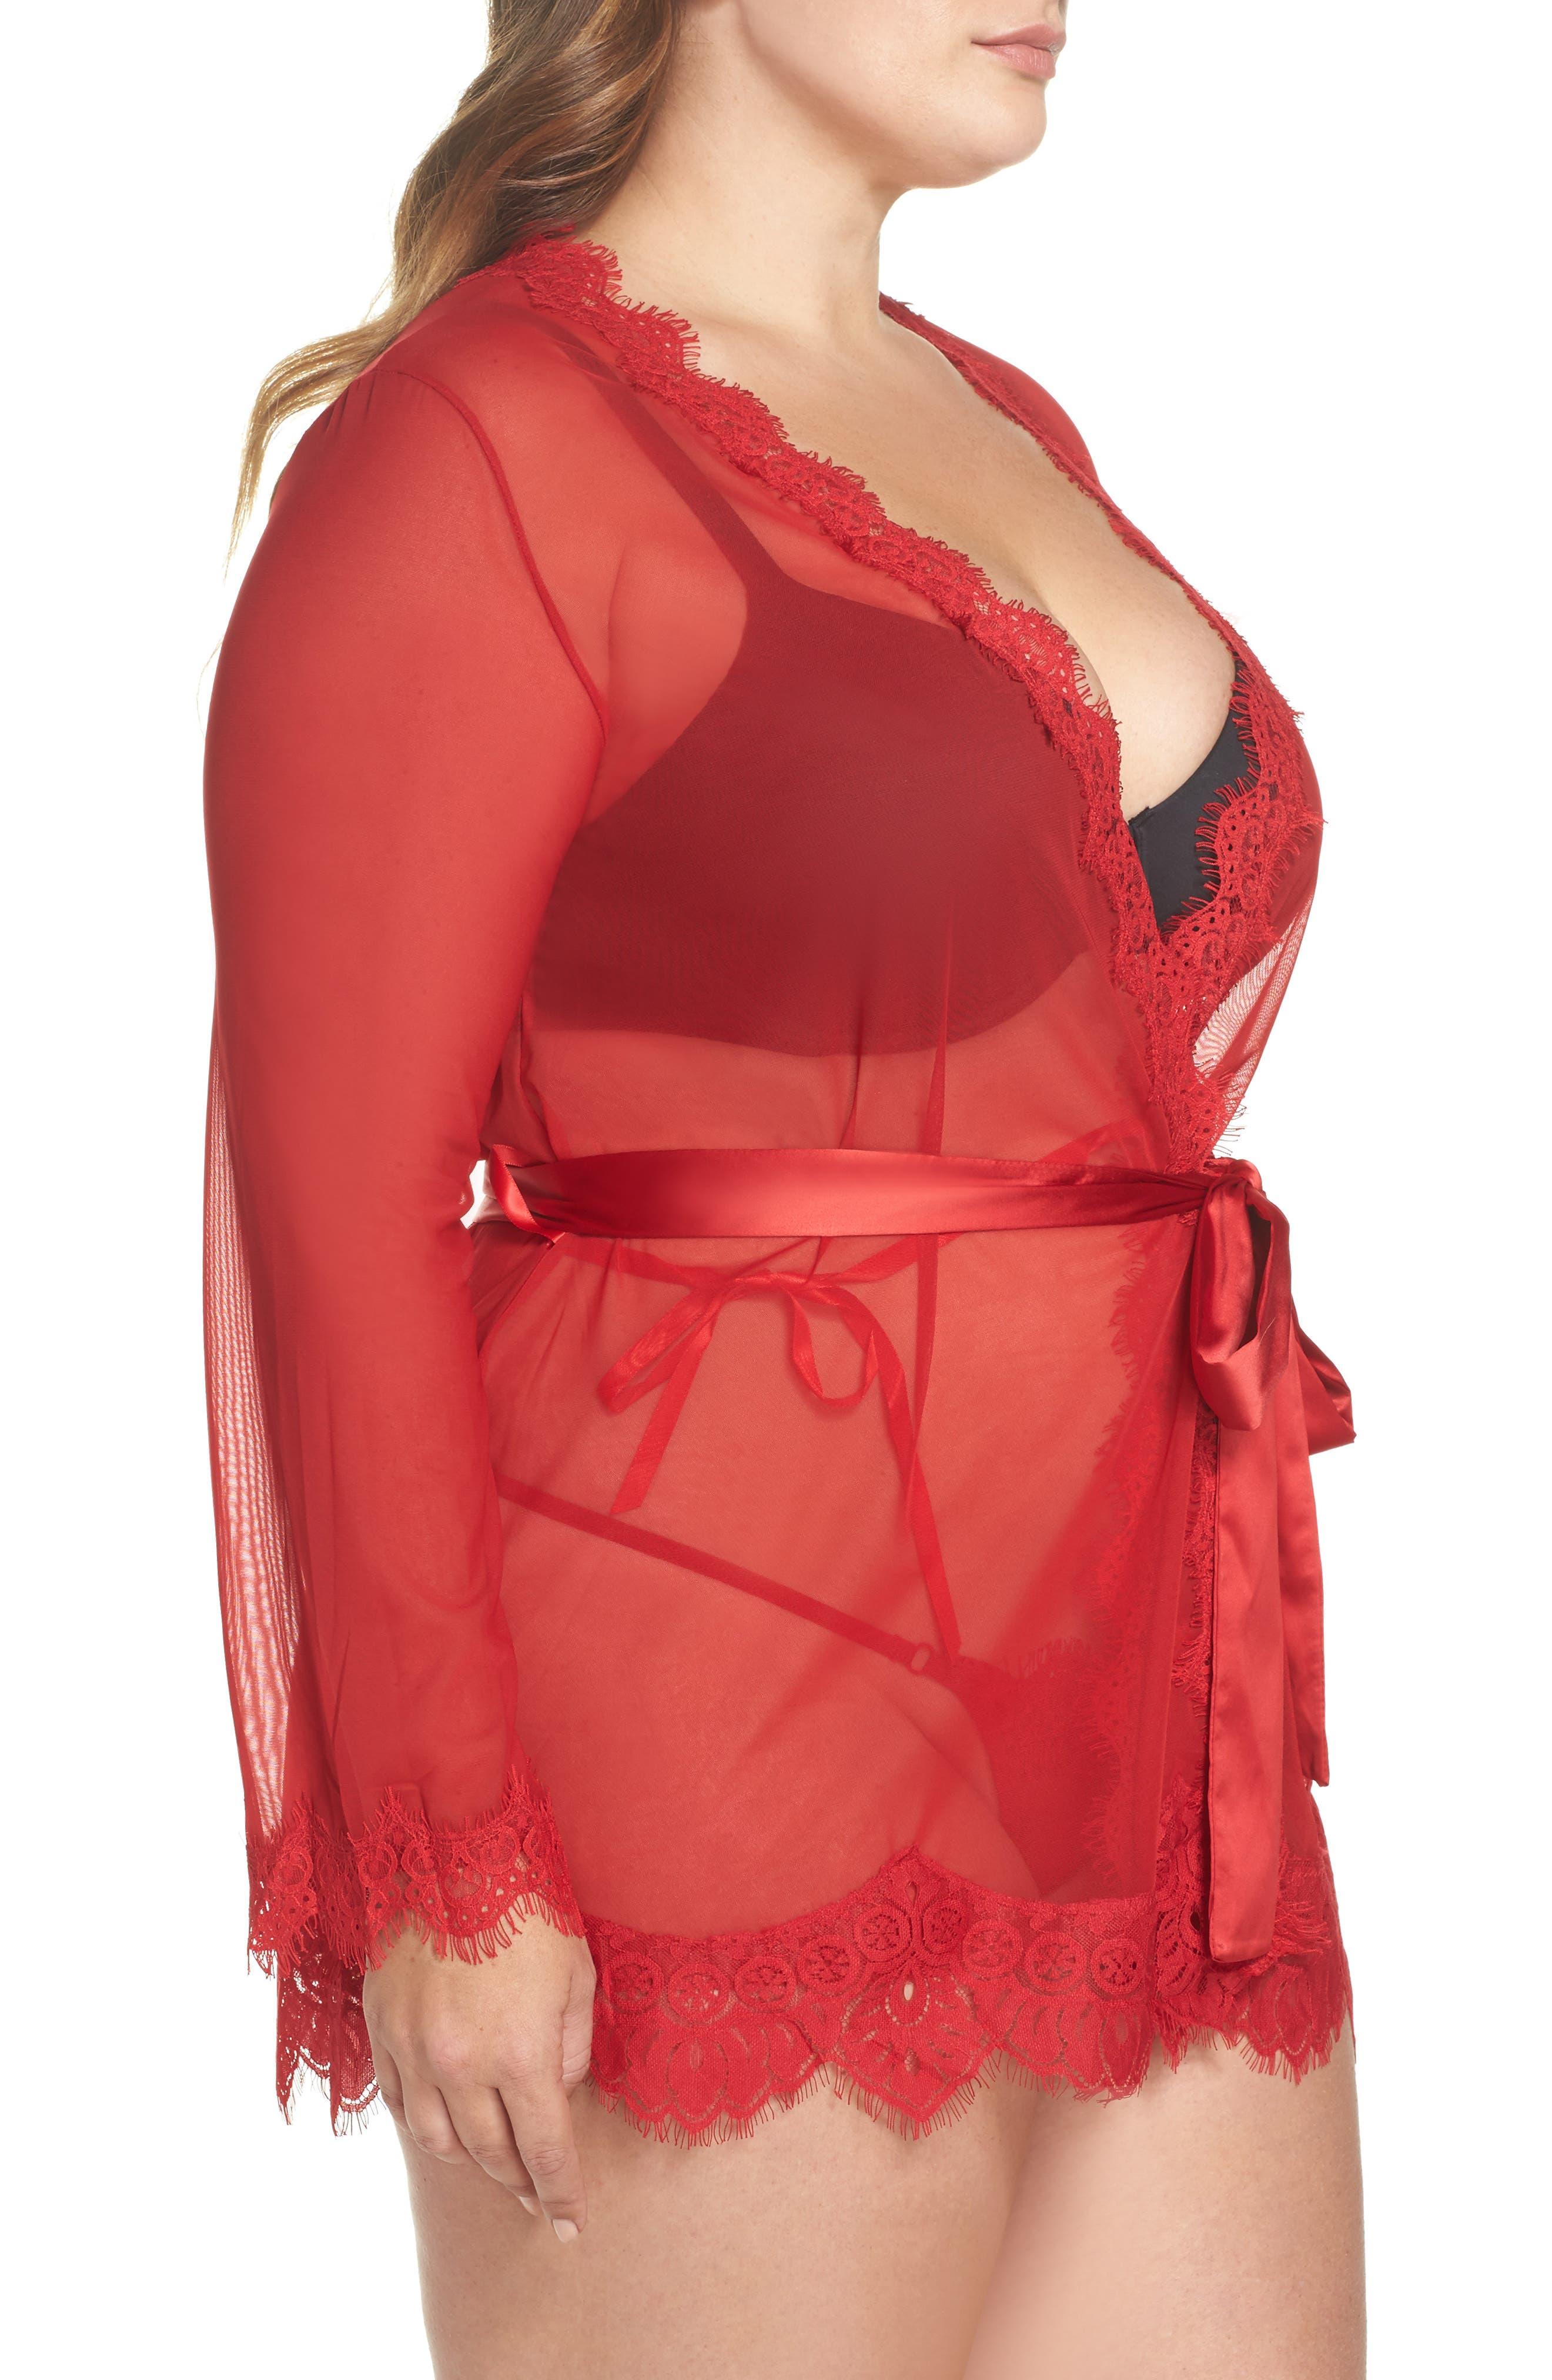 Alternate Image 3  - Oh La La Cheri Eyelash Lace Robe & G-String (Plus Size)